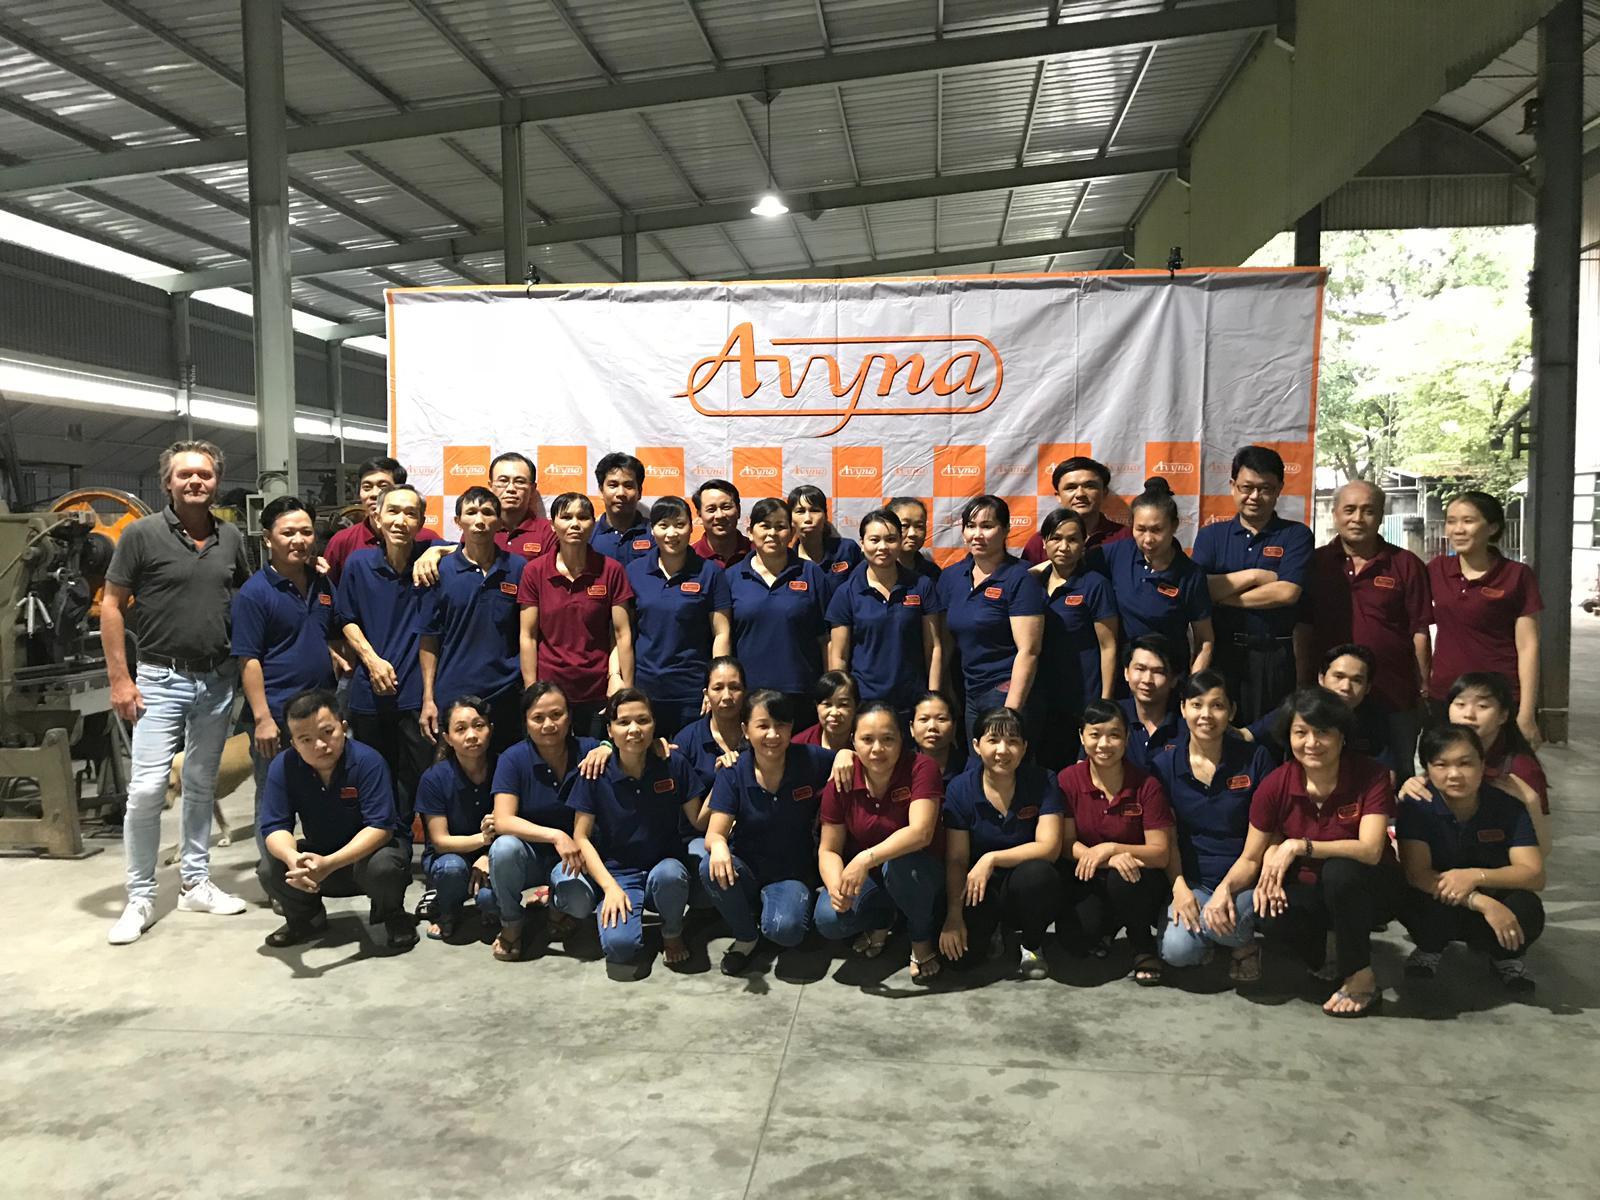 Avyna team Vietnam